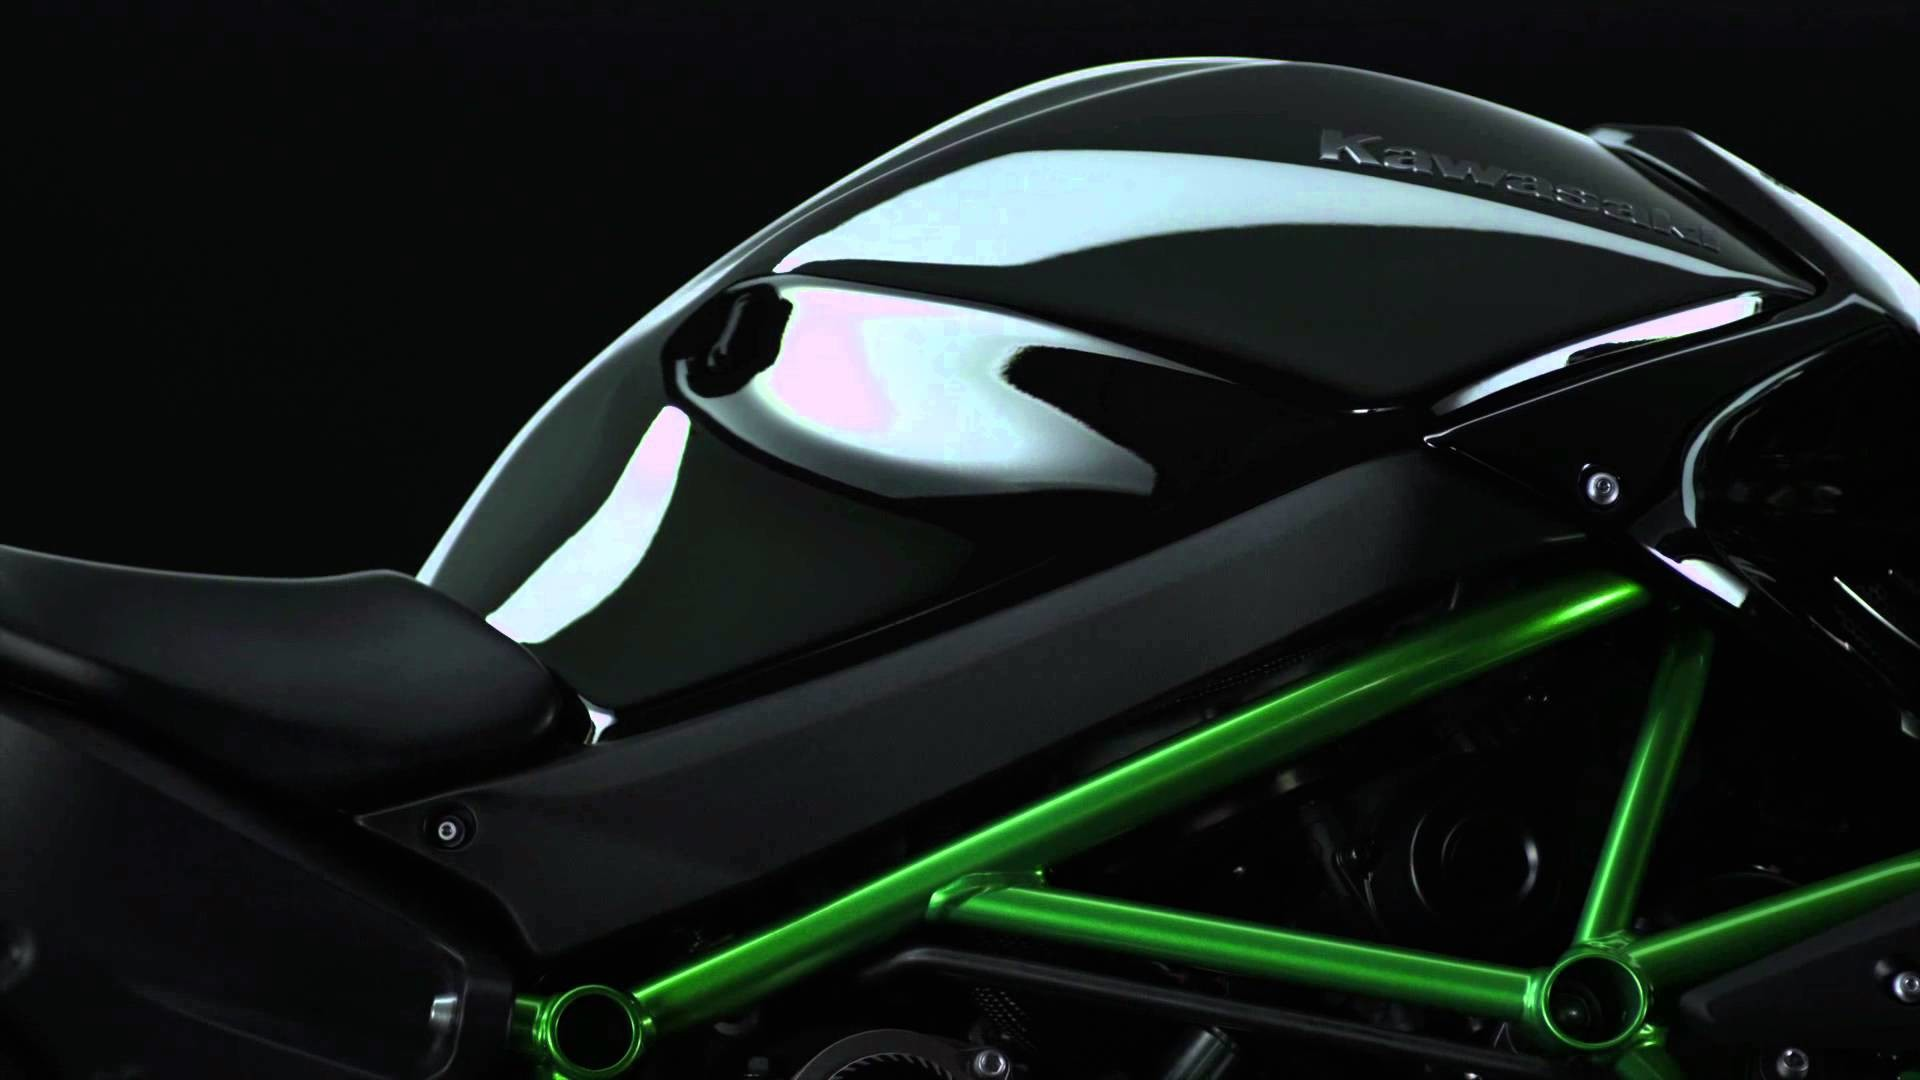 1920x1200 Ninja Kawasaki Bike HD Wallpaper